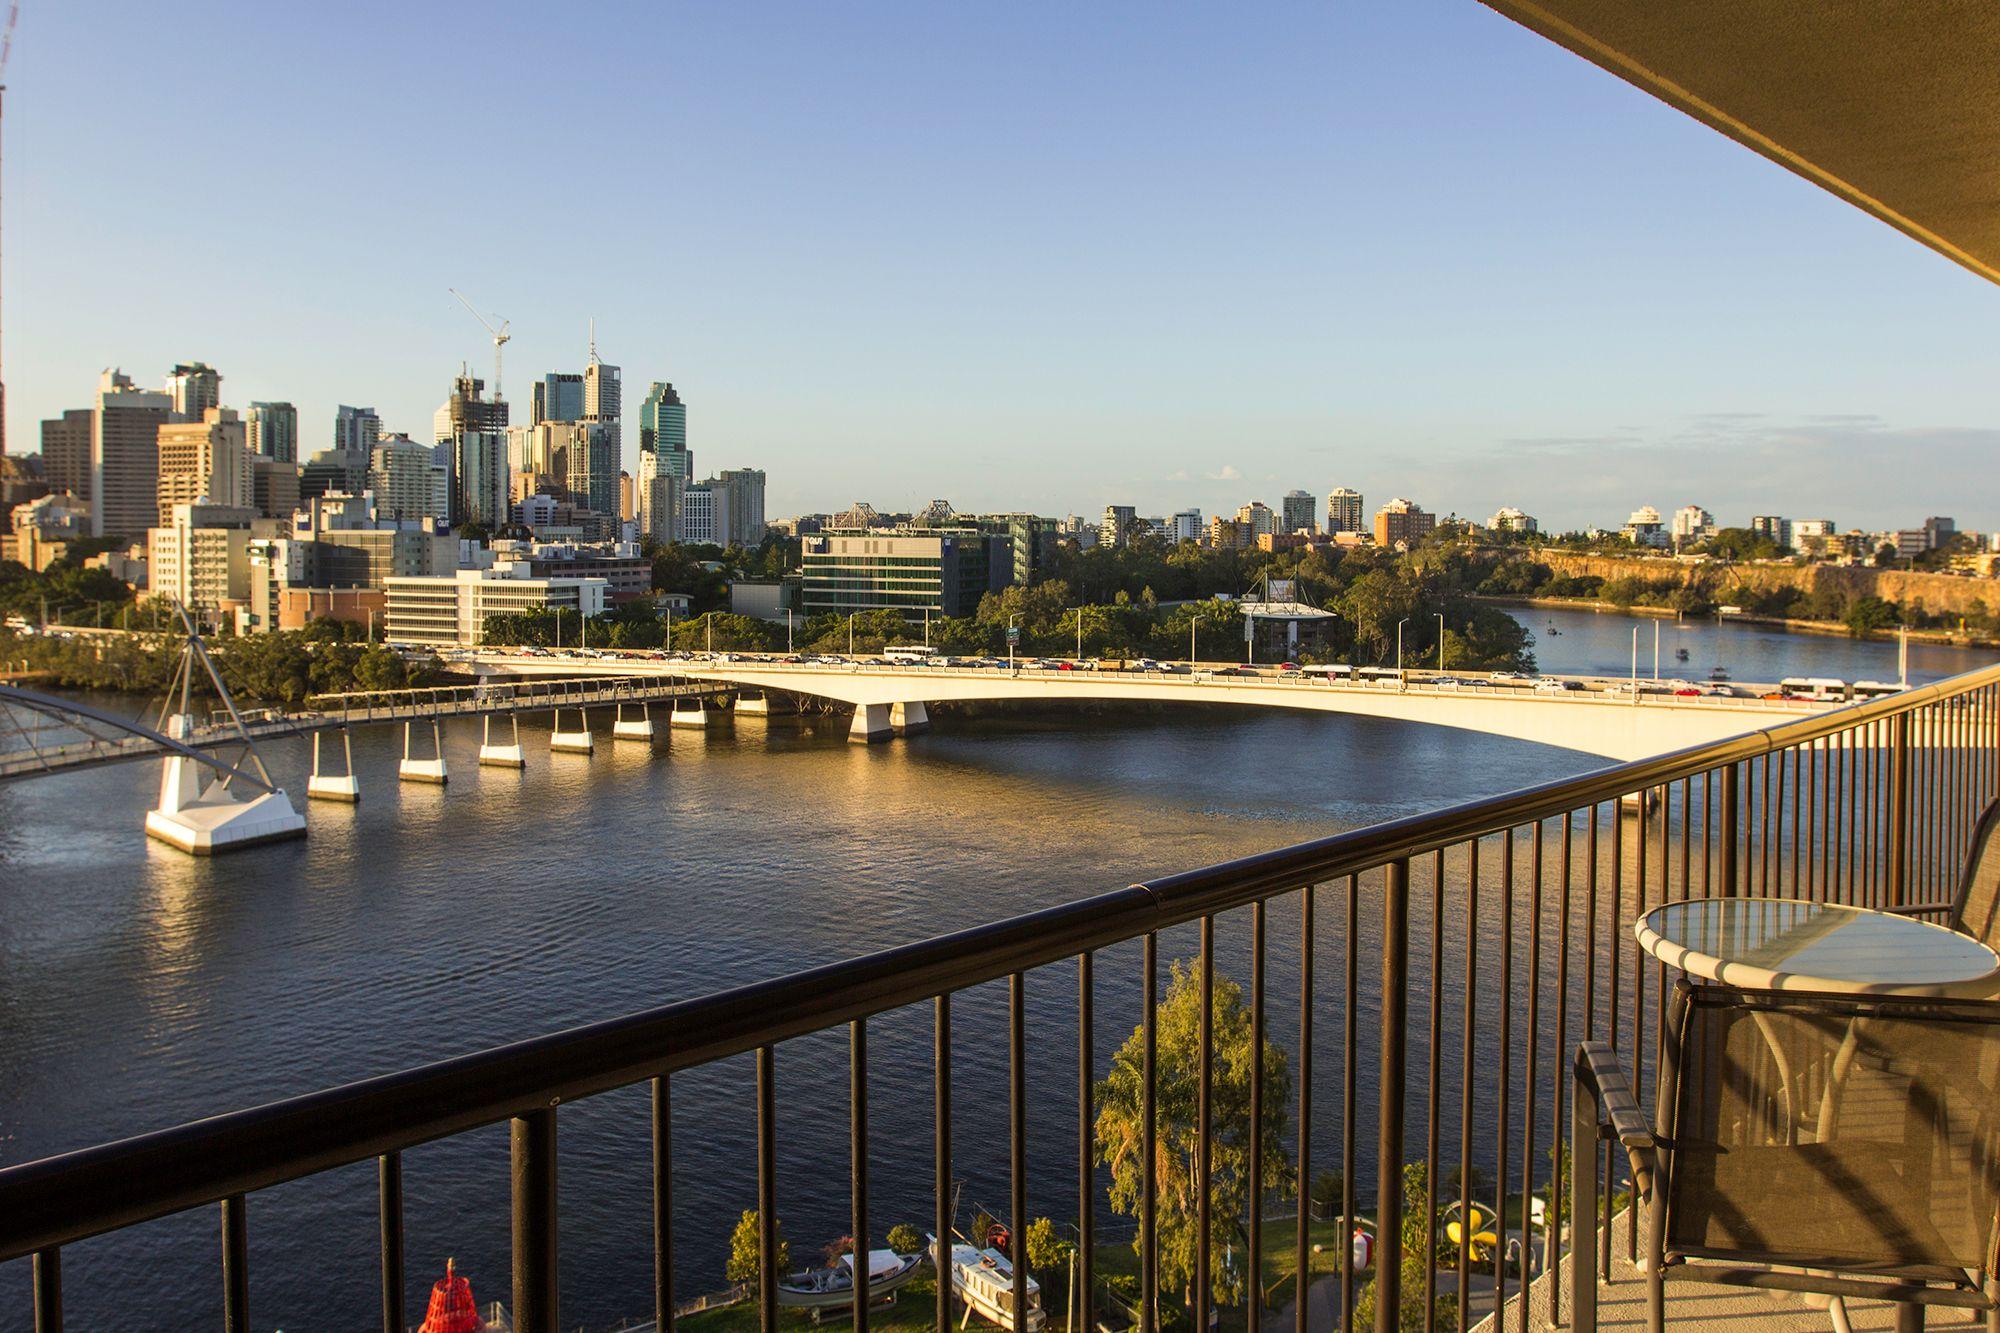 51/21 Dock Street South Brisbane 4101